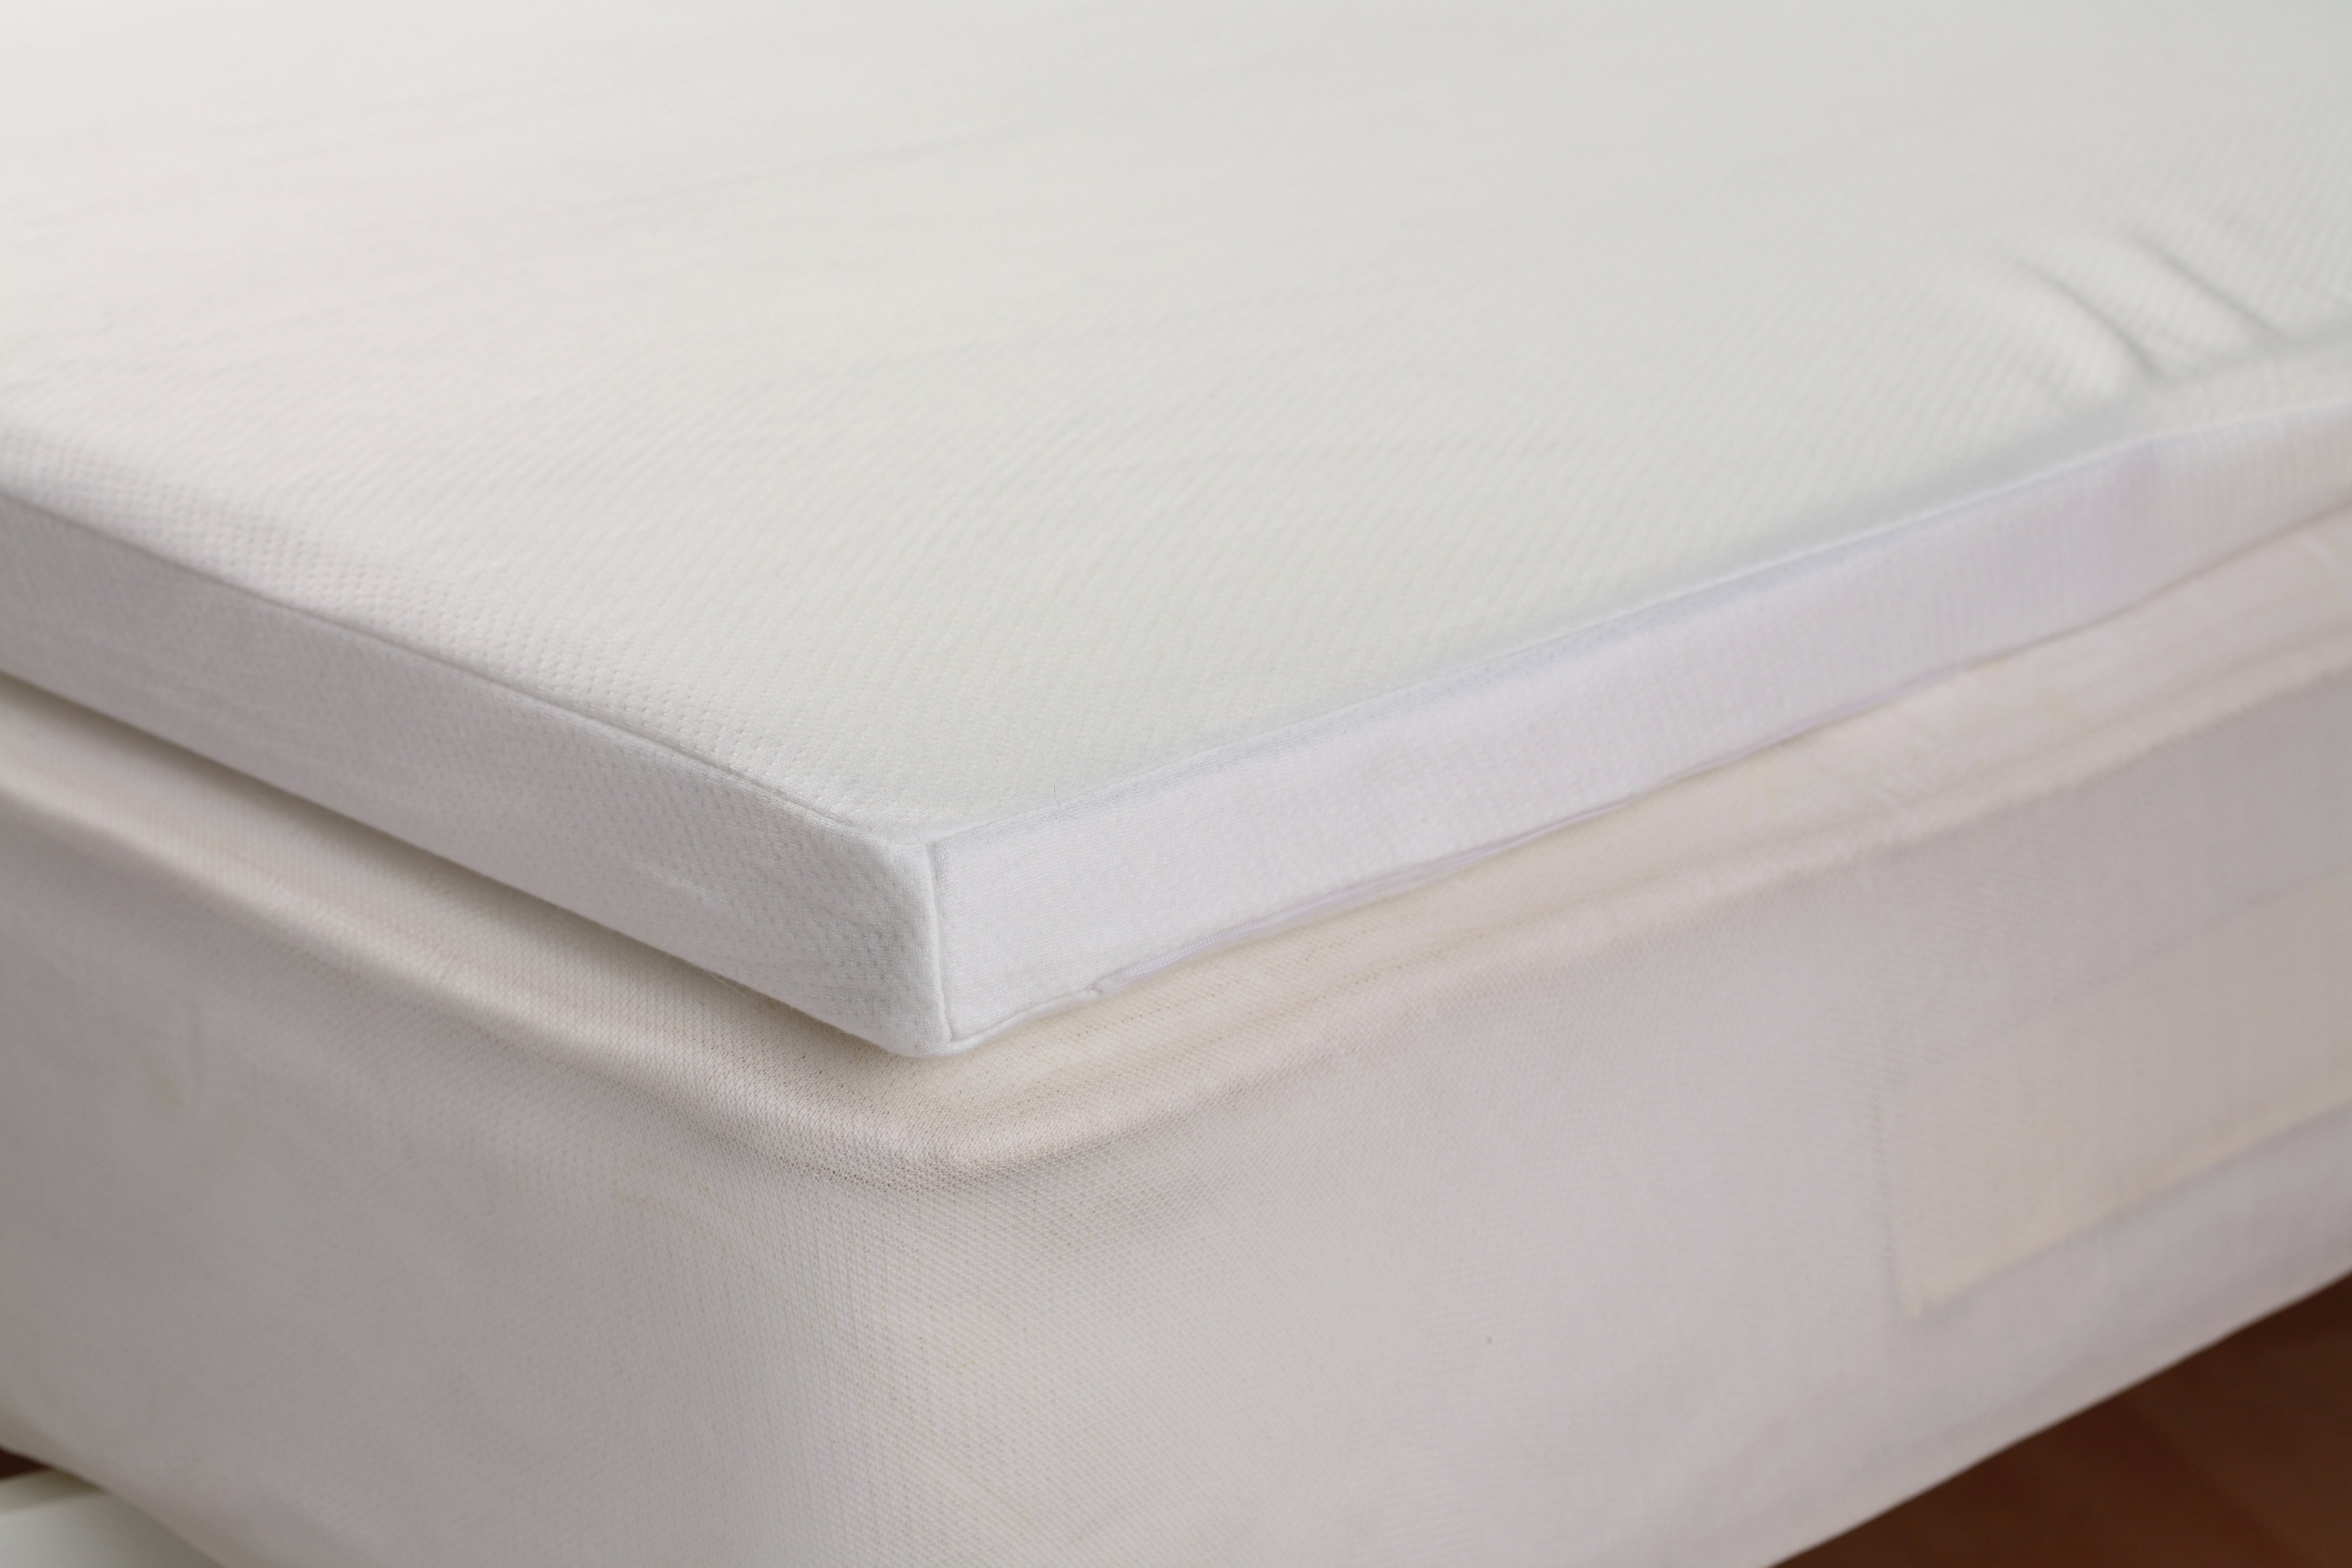 downland 2 memory foam topper single. Black Bedroom Furniture Sets. Home Design Ideas